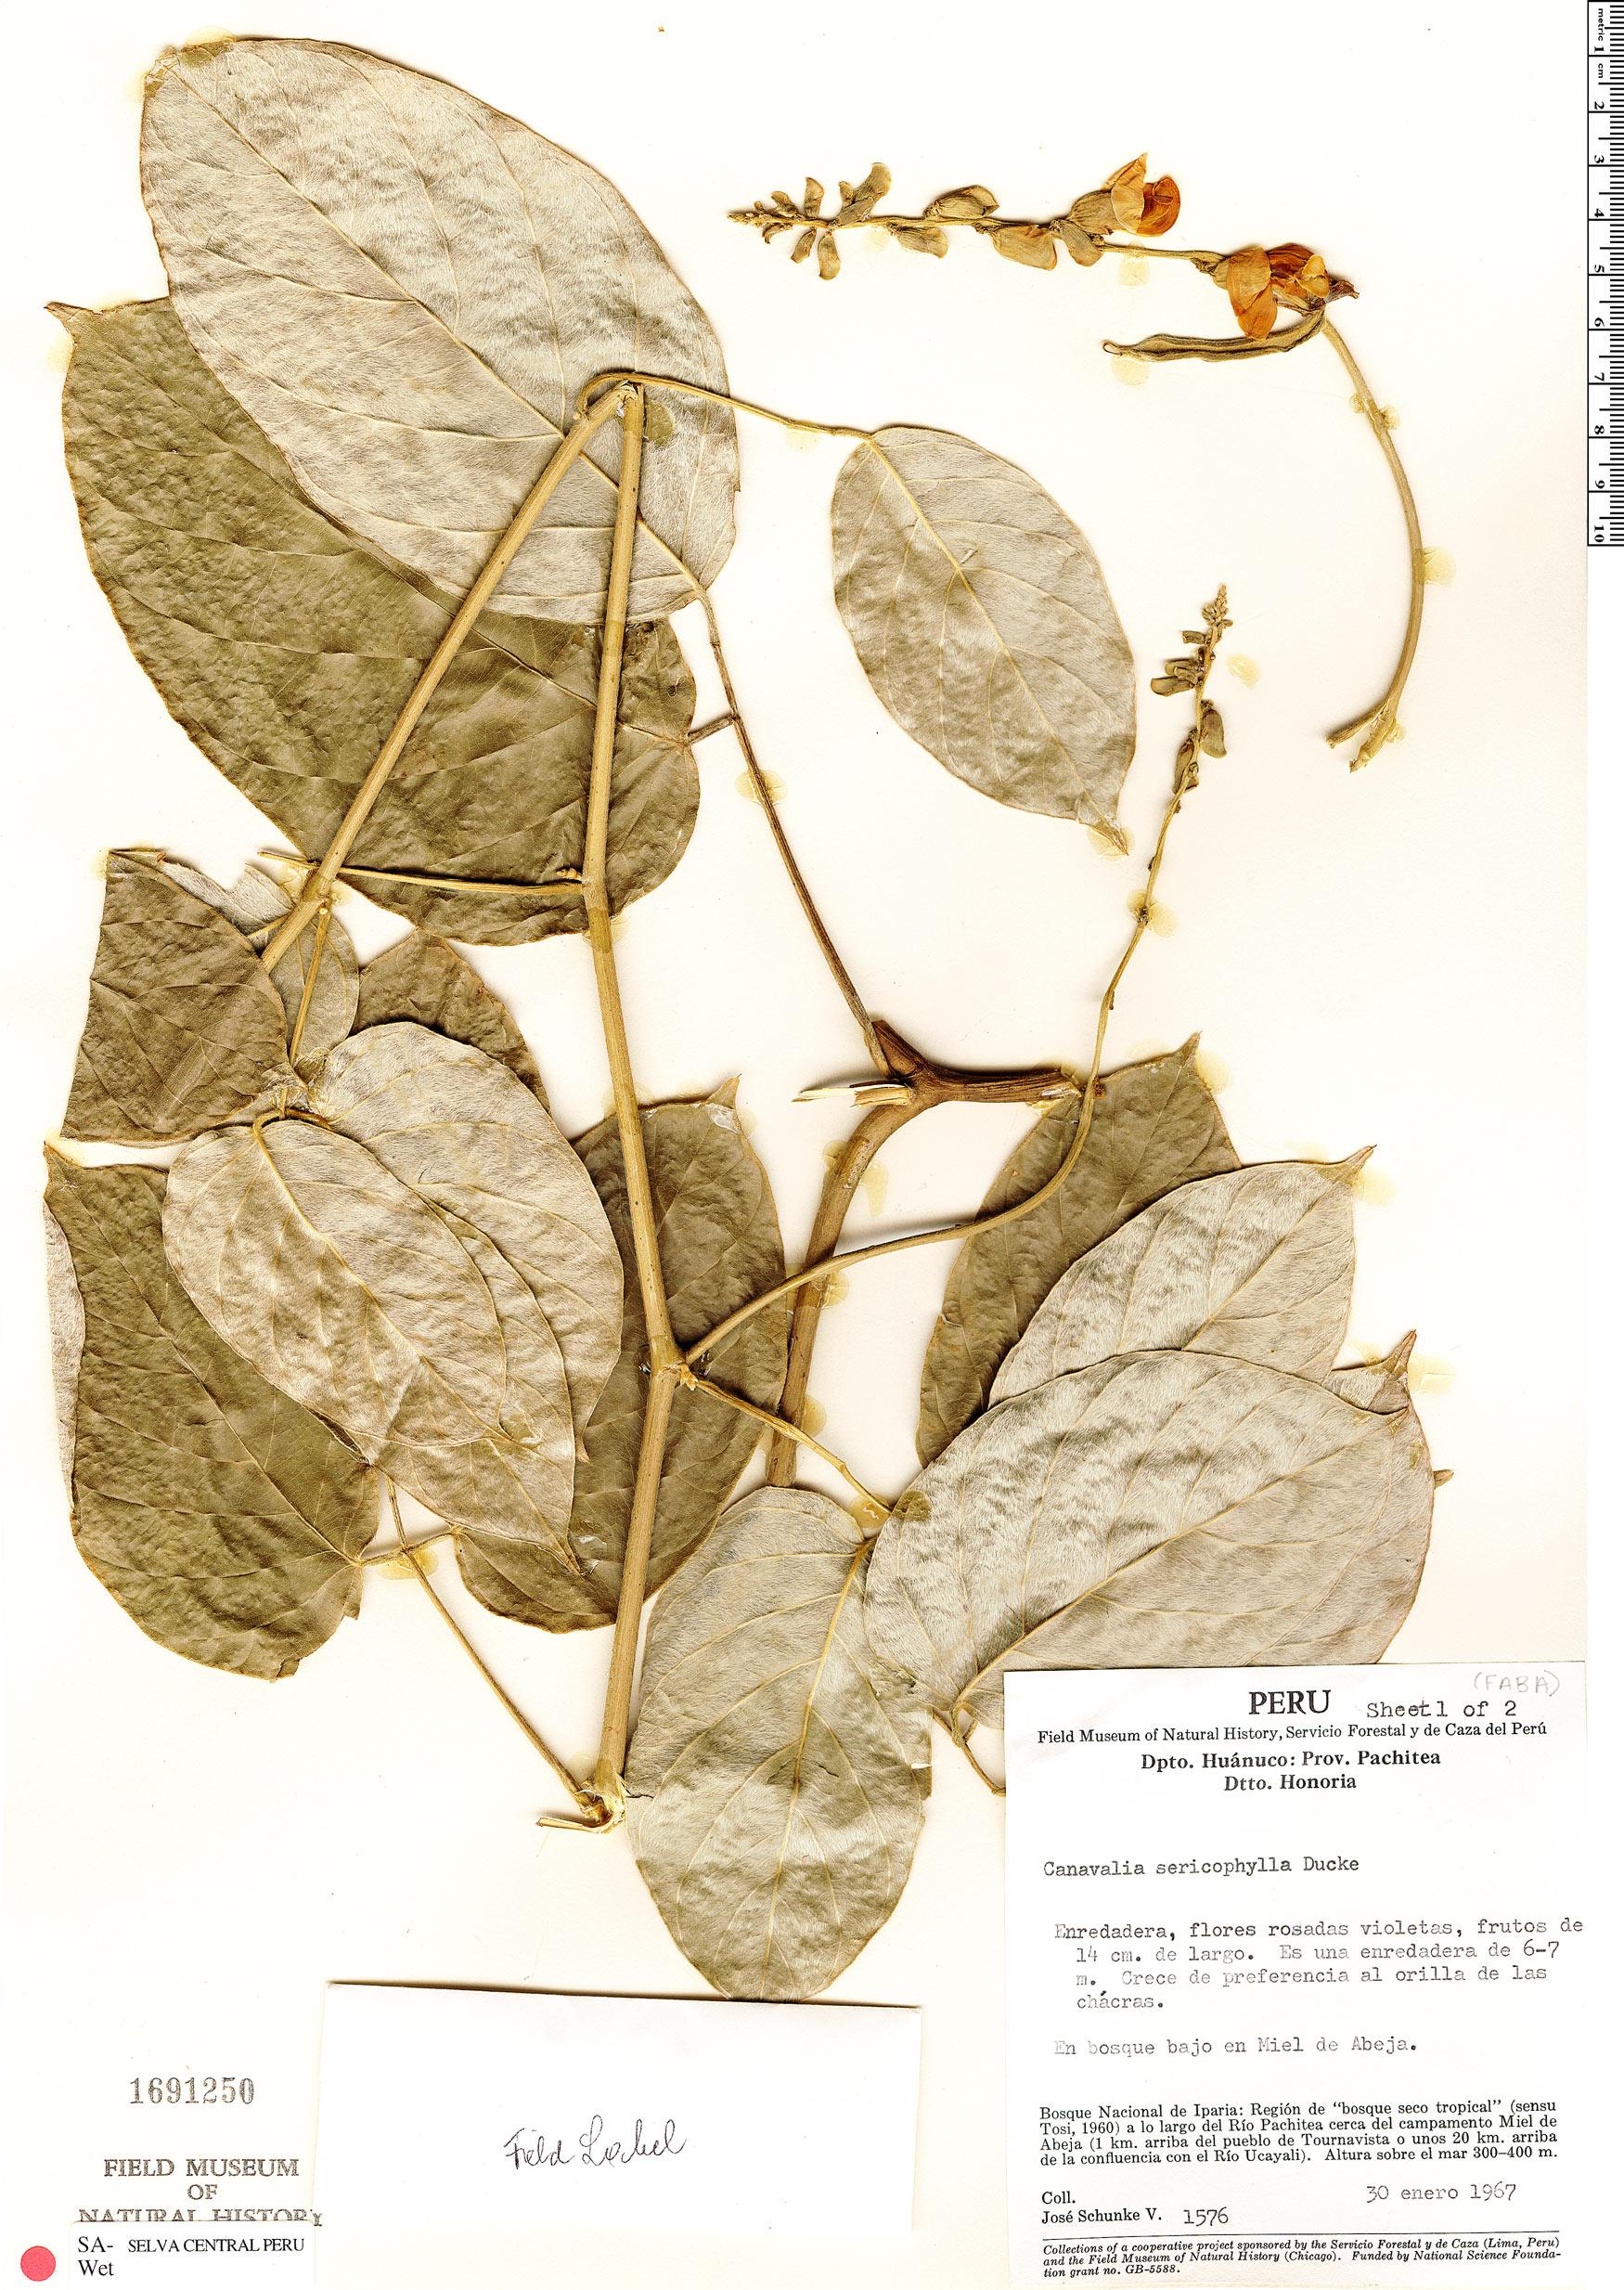 Specimen: Canavalia sericophylla